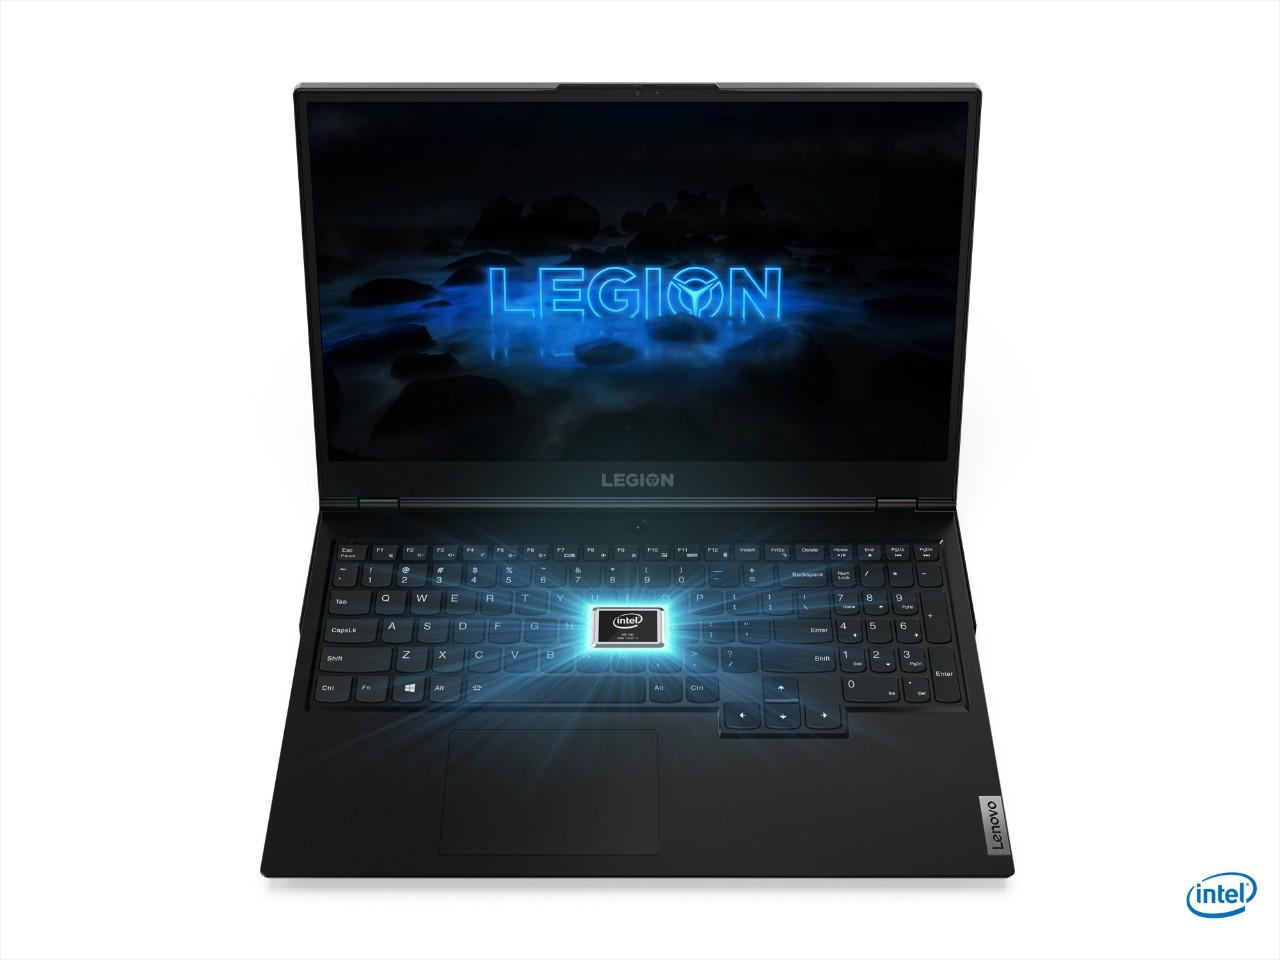 Lenovo Premium Destek Hizmeti